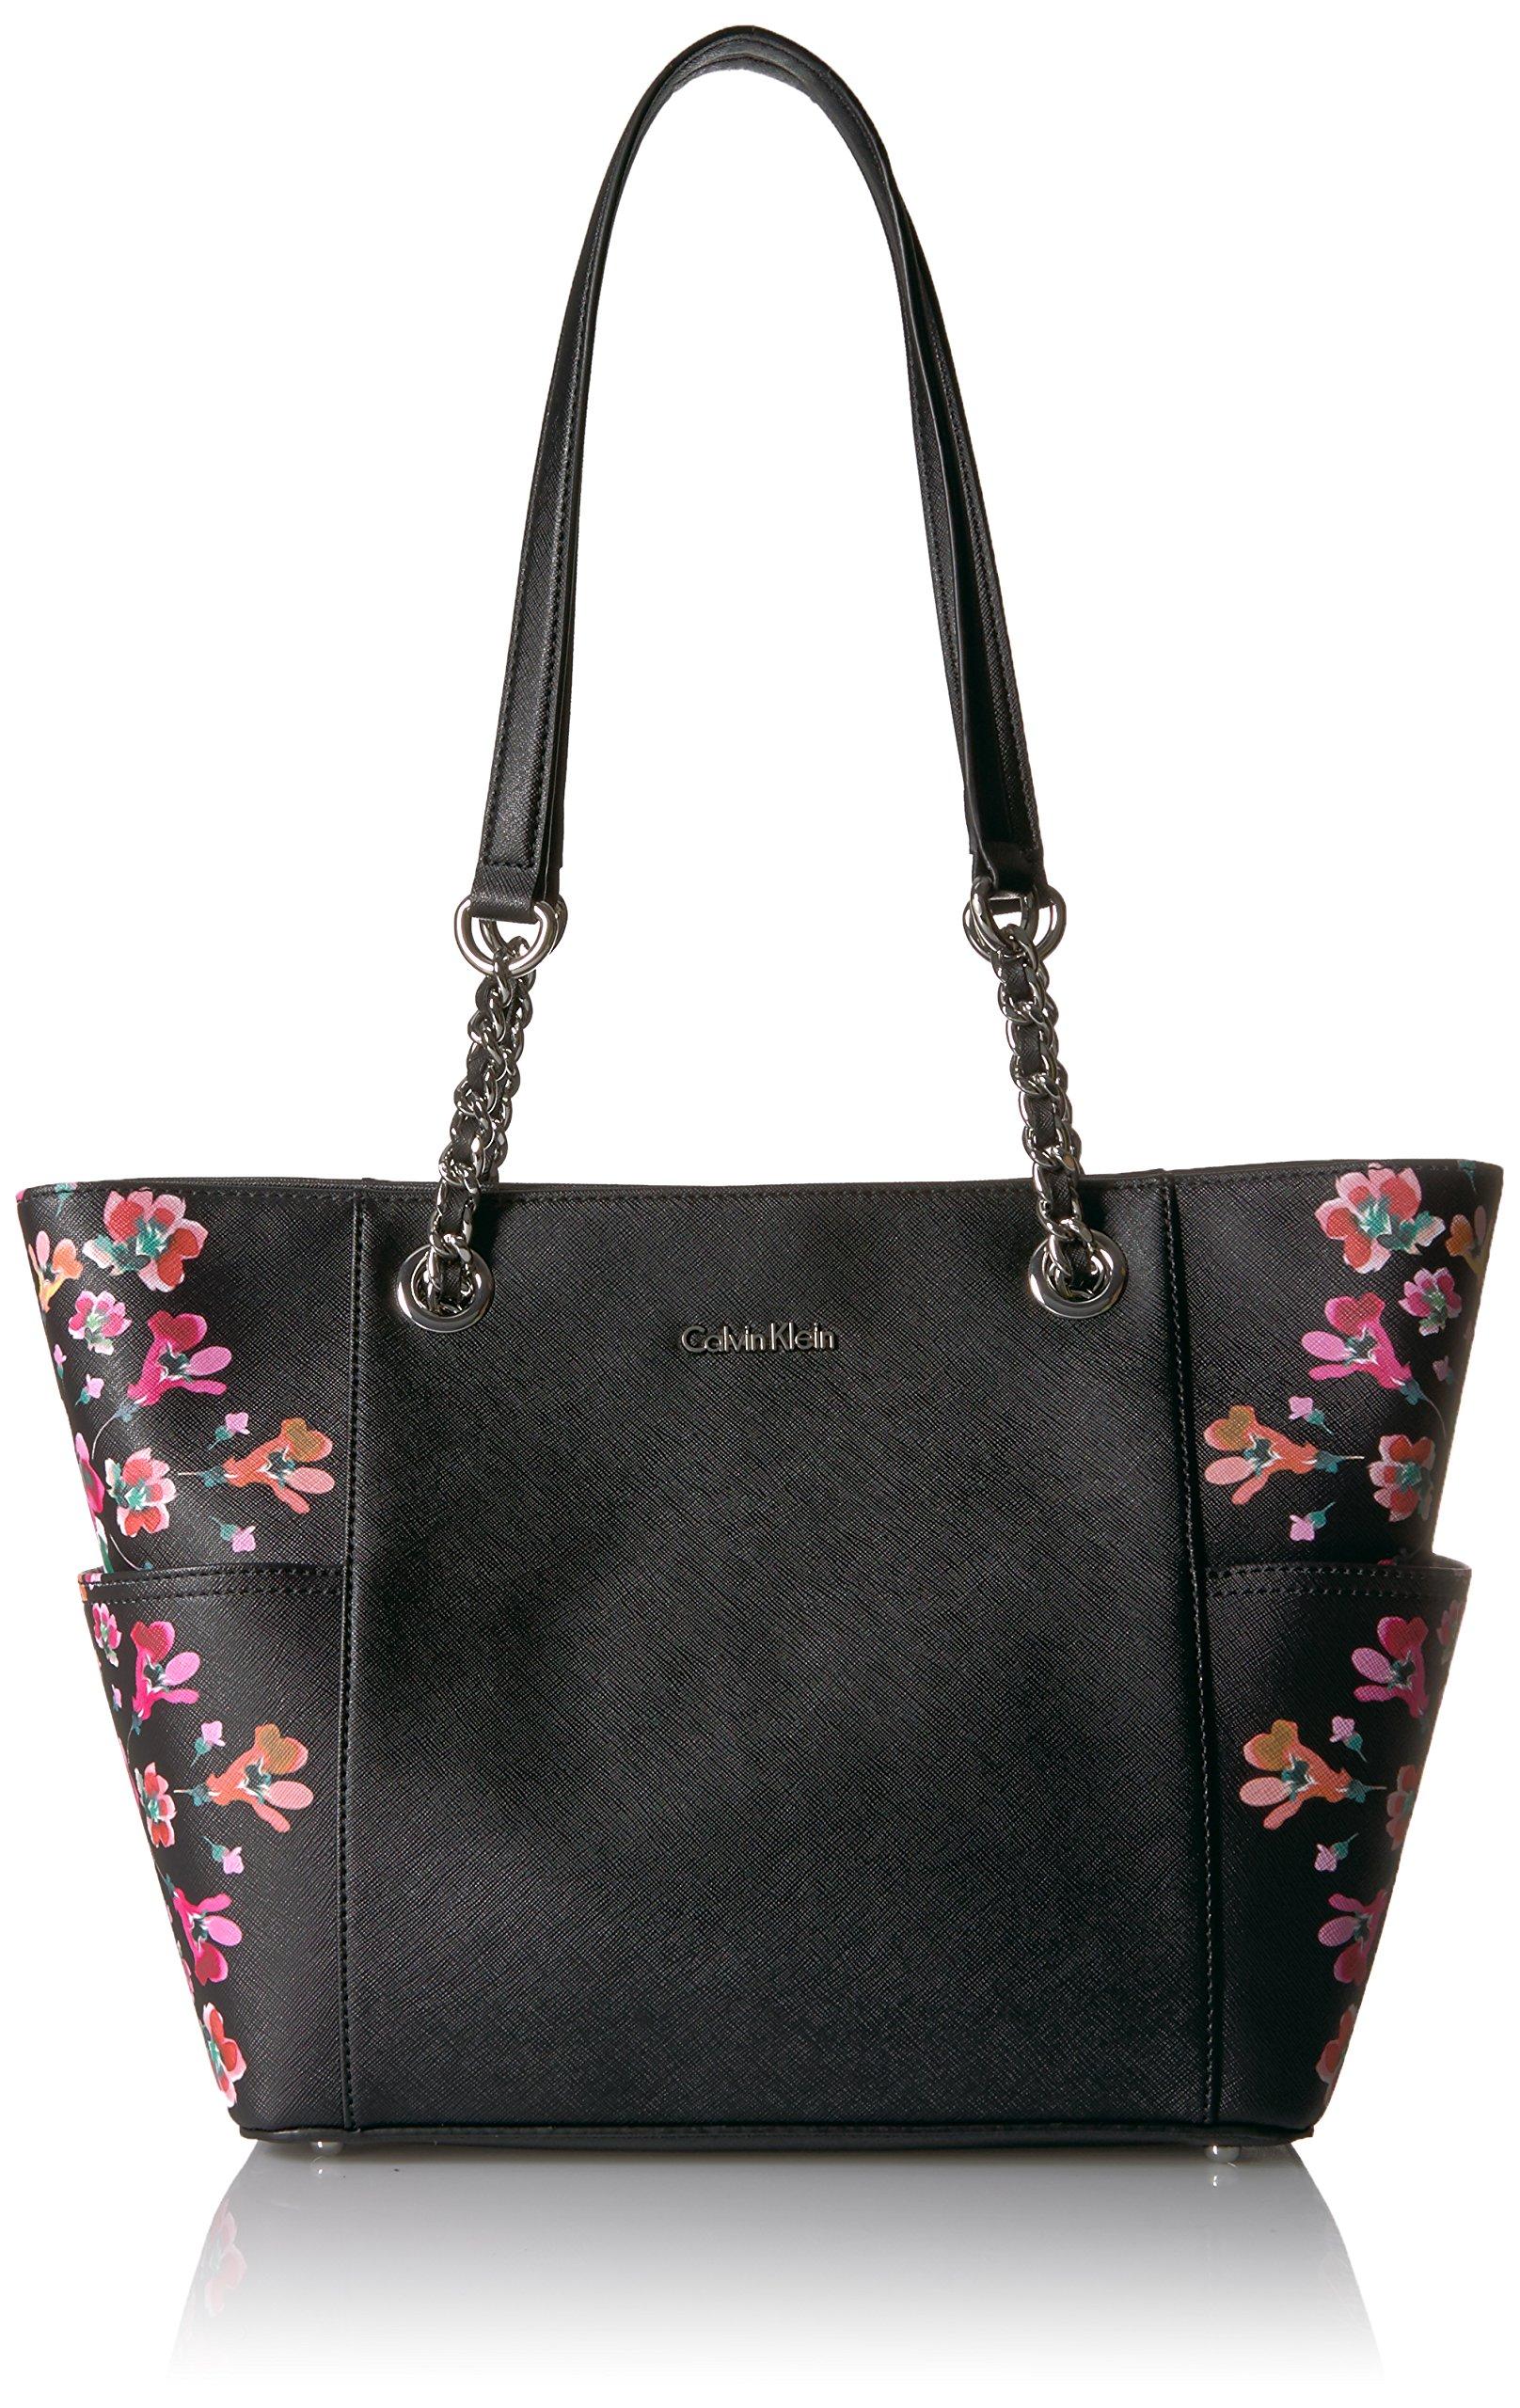 Calvin Klein Key Item Floral Printed Saffiano Chain Tote